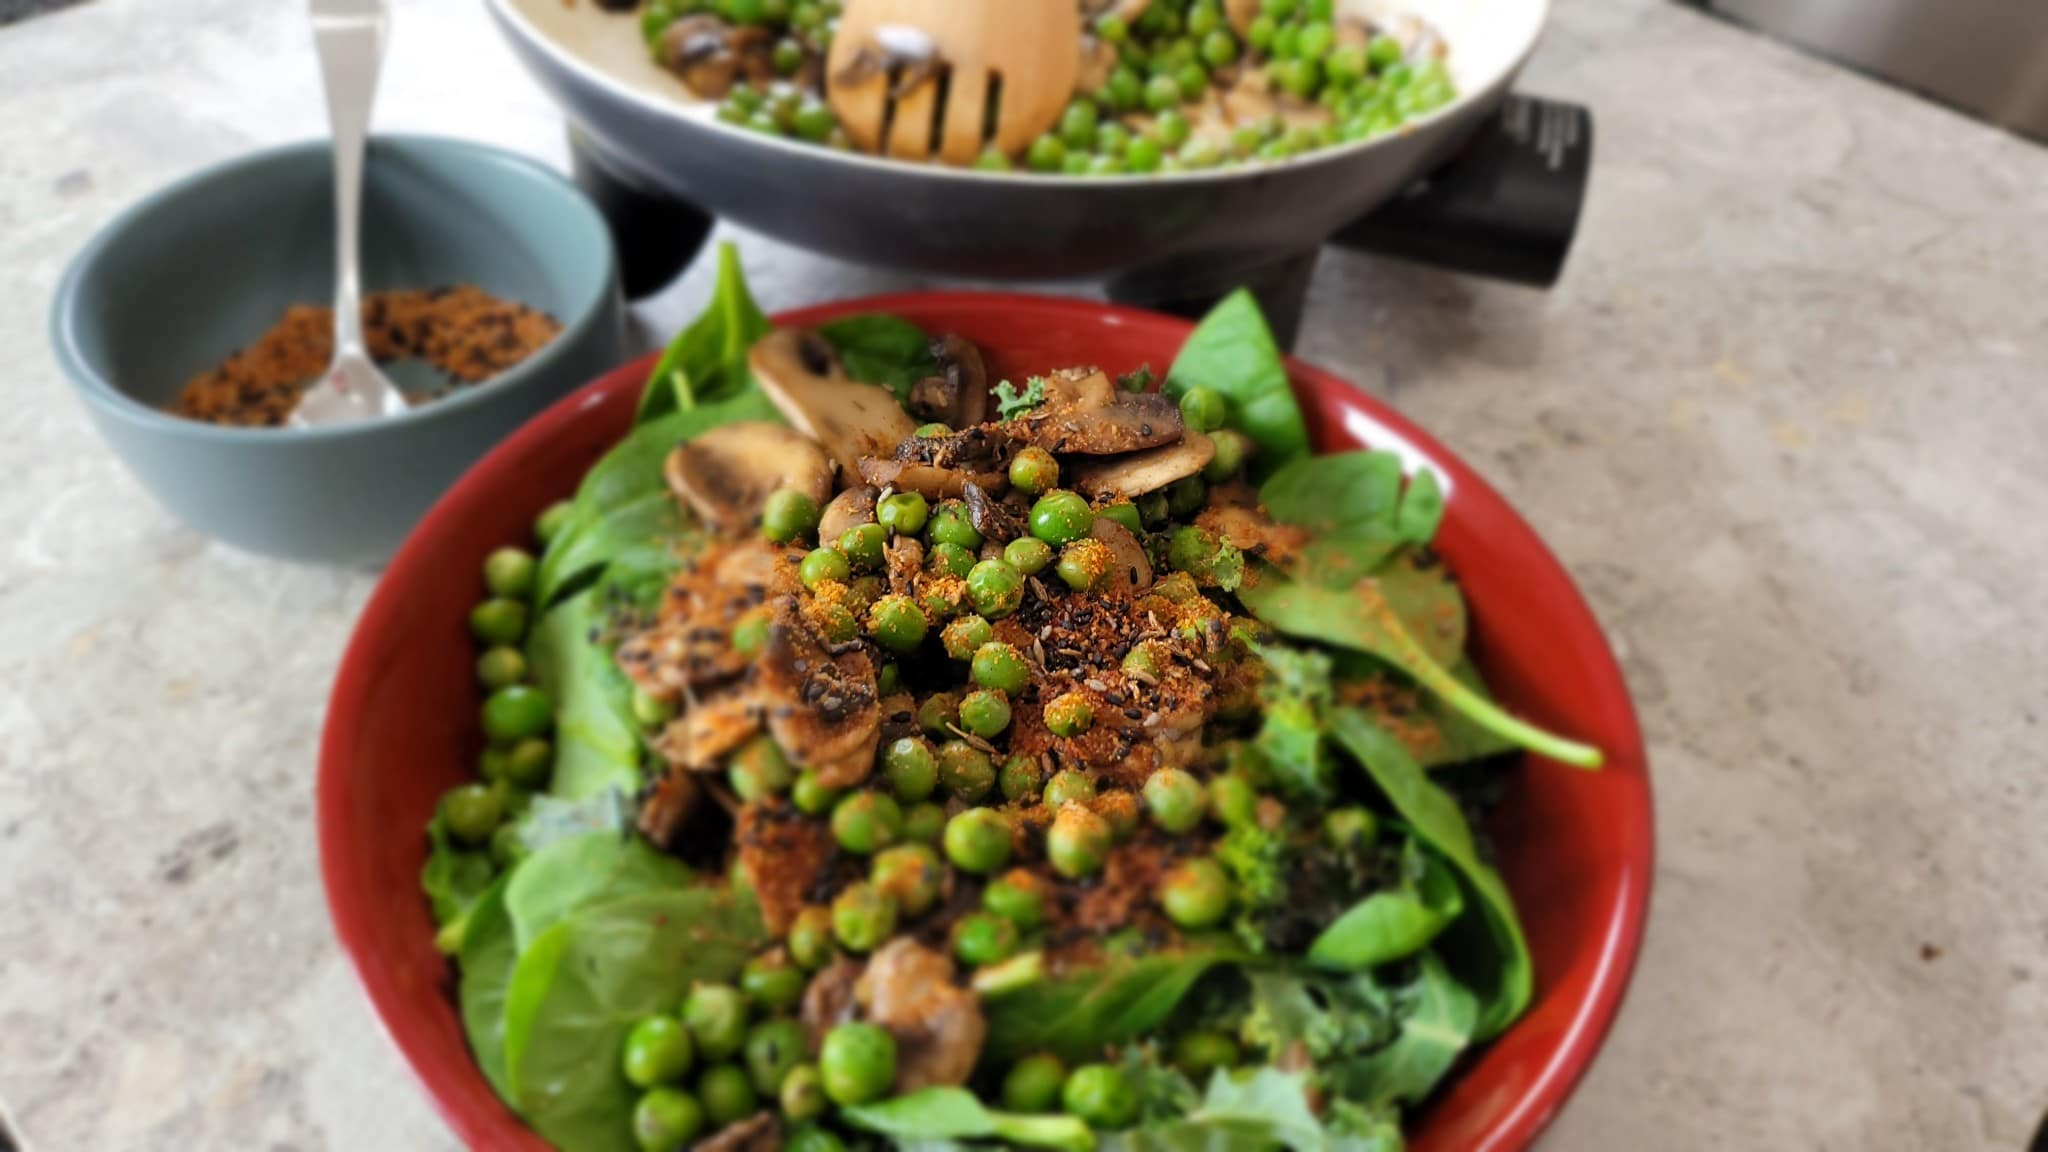 dukkah mushrooms with peas and fresh greens